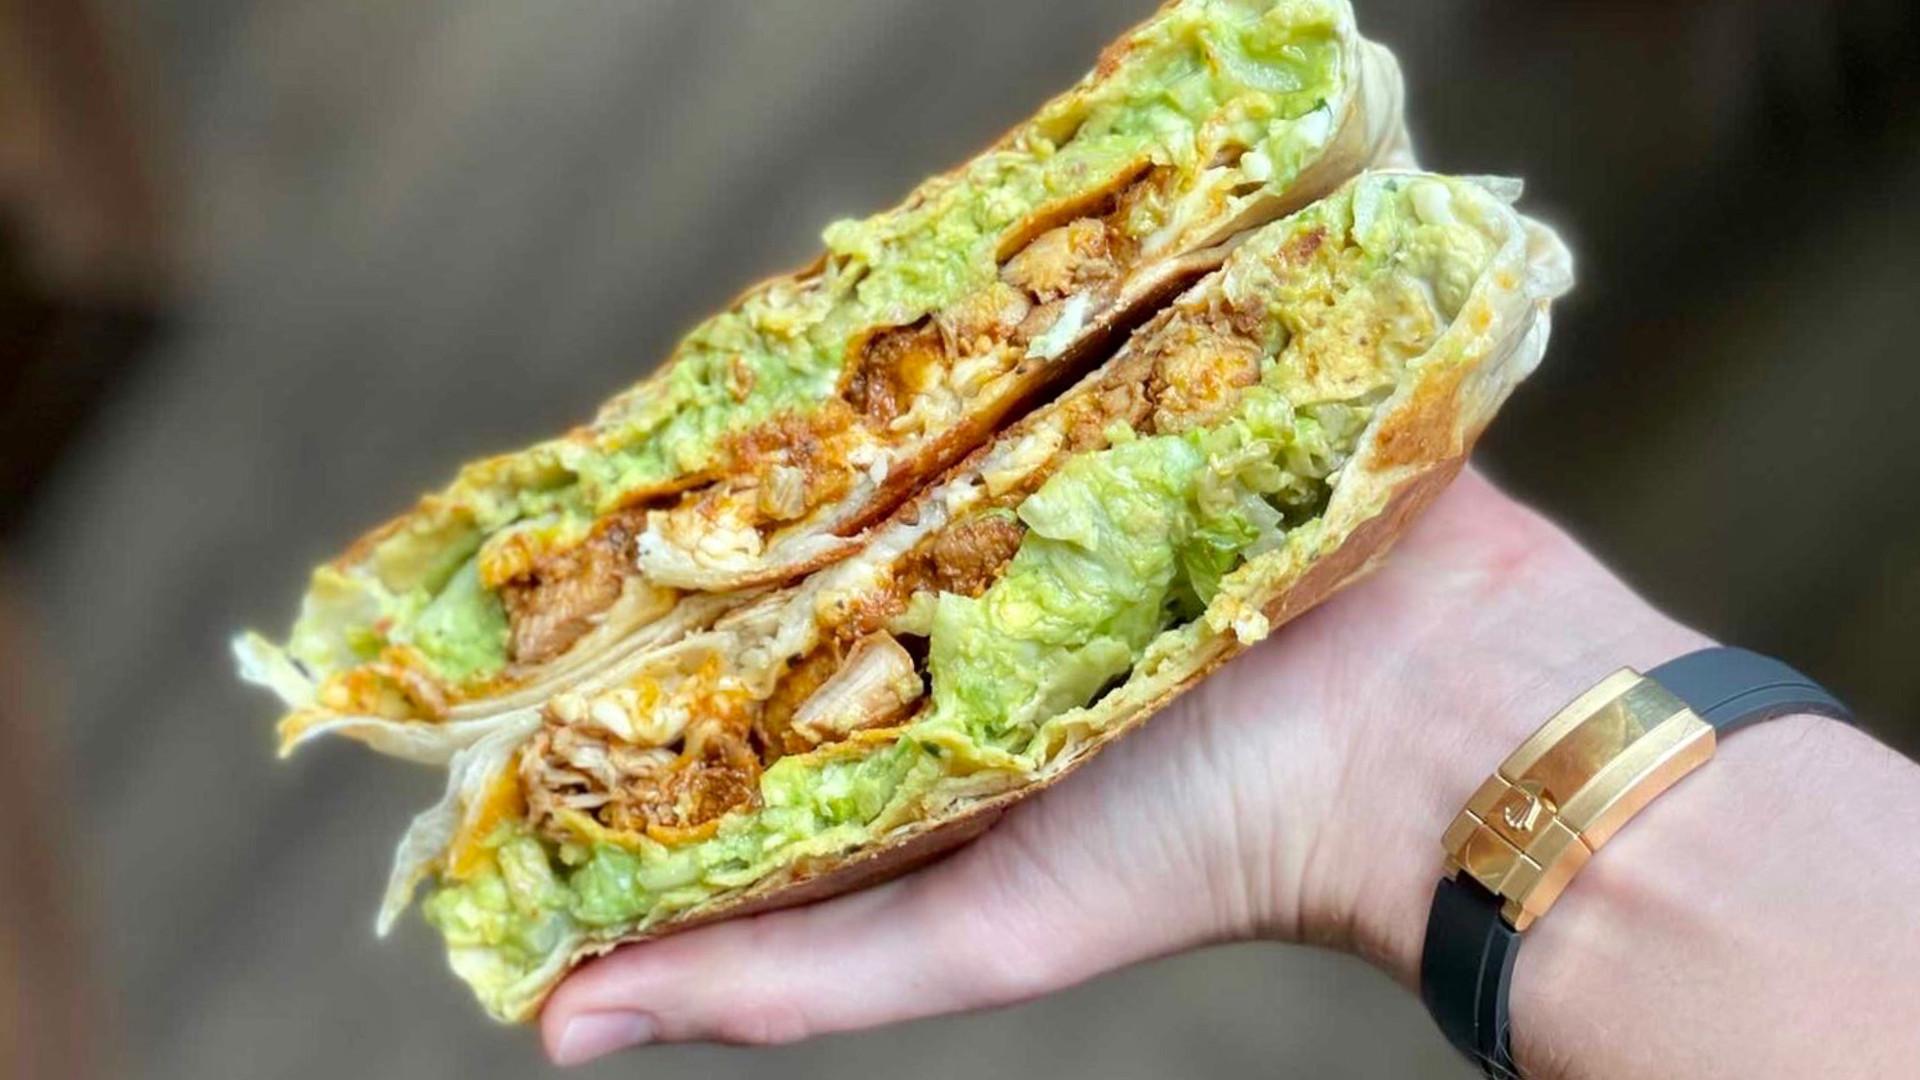 The best new restaurants in Toronto | Cali Crunch at Man vs Fries